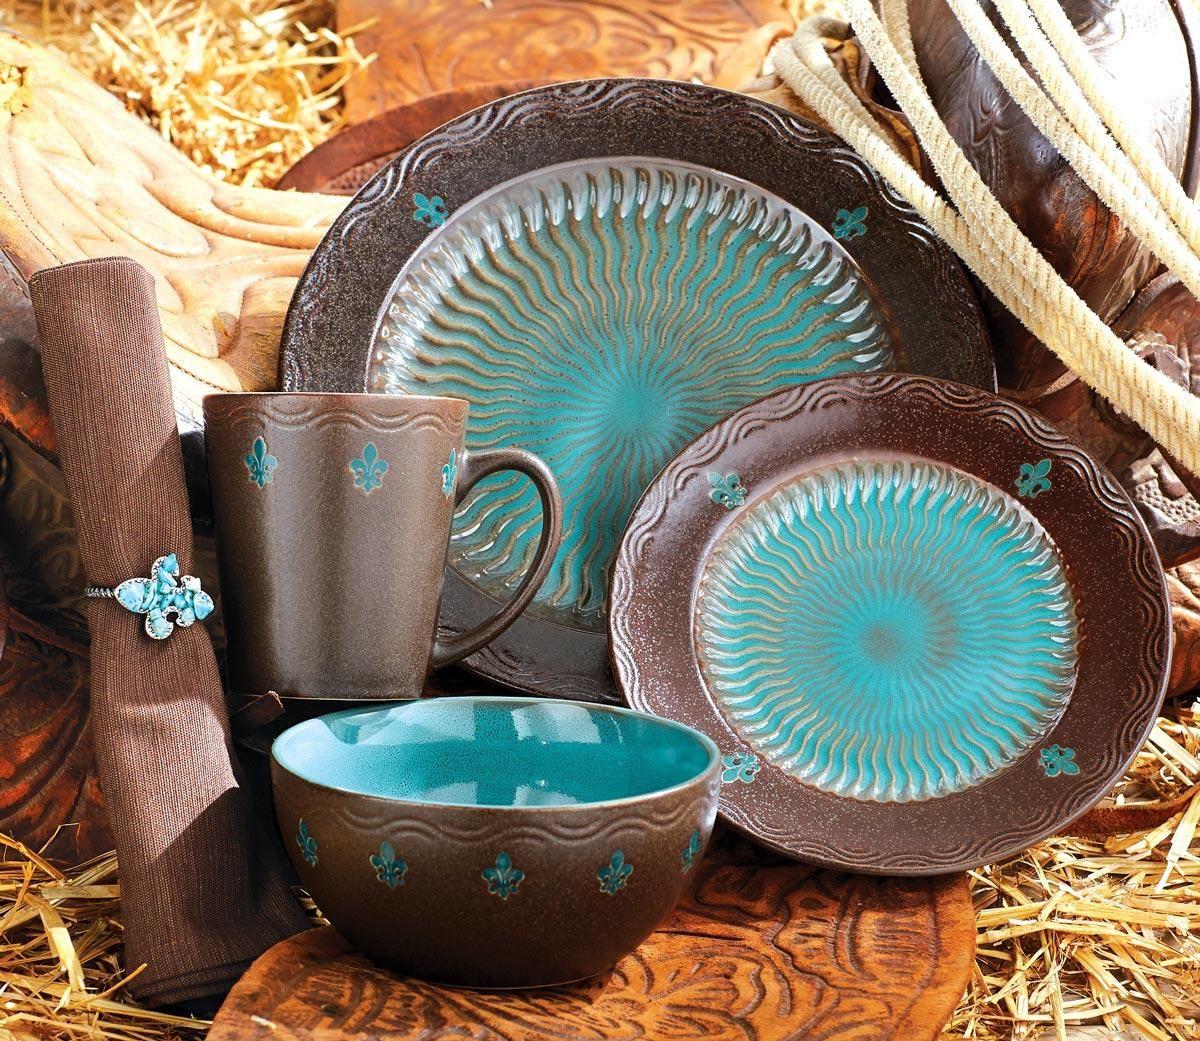 Western kitchen decor - Kitchens Monarch Dinnerware Collection Fresh And Antique Design Of Fleur De Lis Dinnerware Sets With